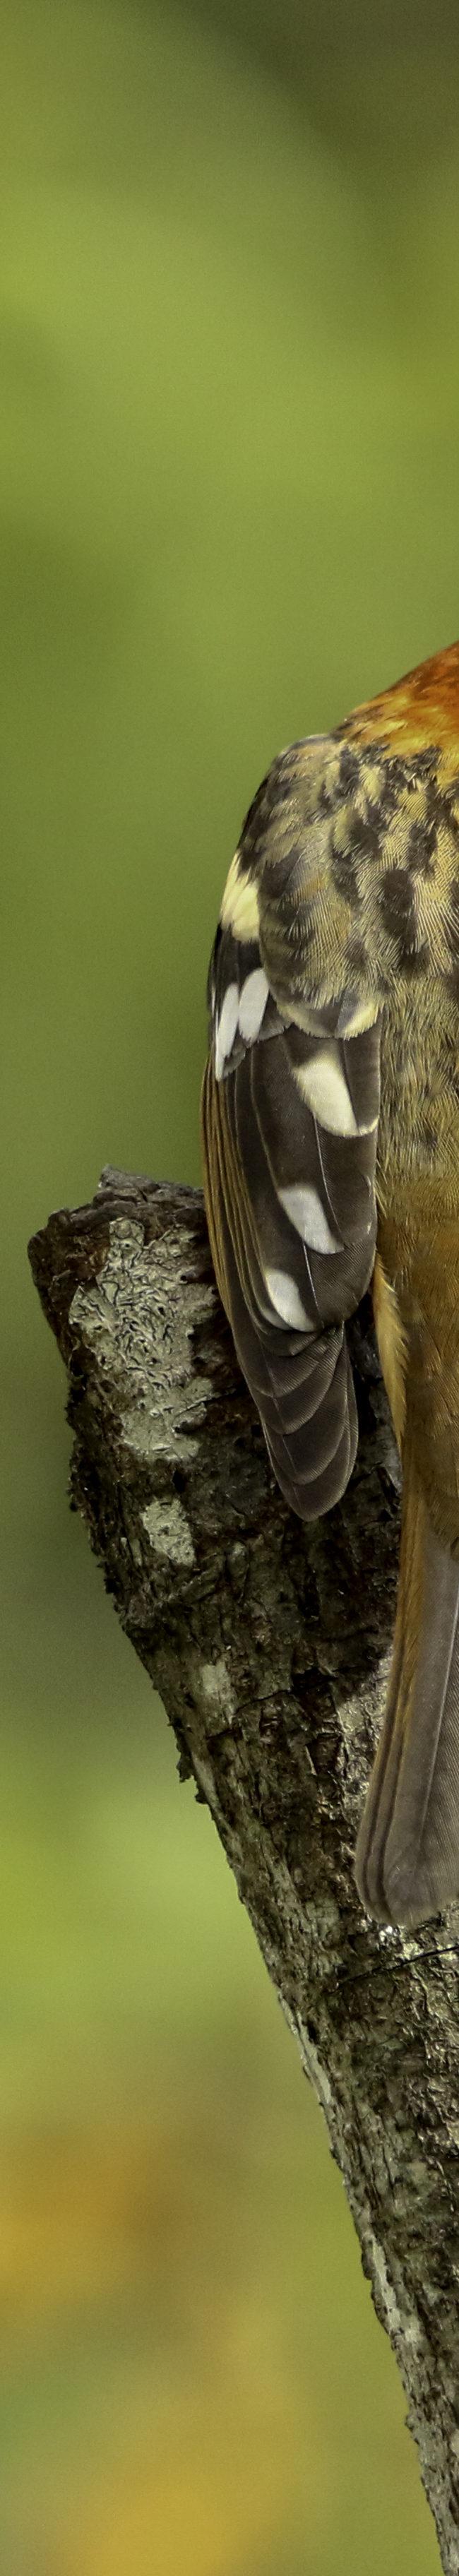 Vlekrugtroepiaal / Streak-backed Oriole (Icterus pustulatus) (male)